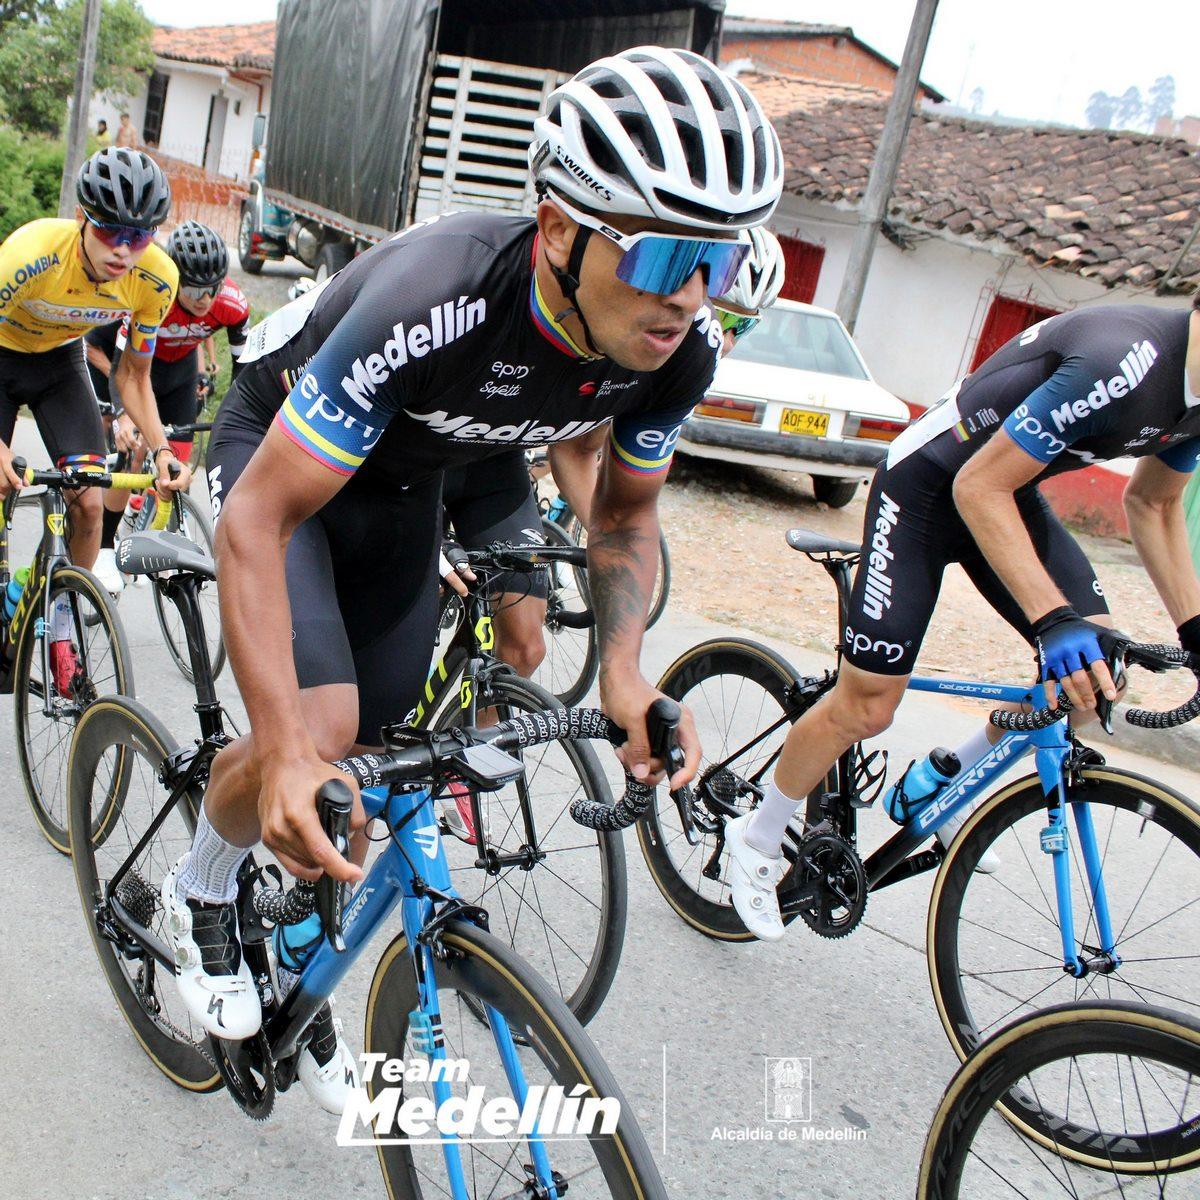 Team Medellin 4